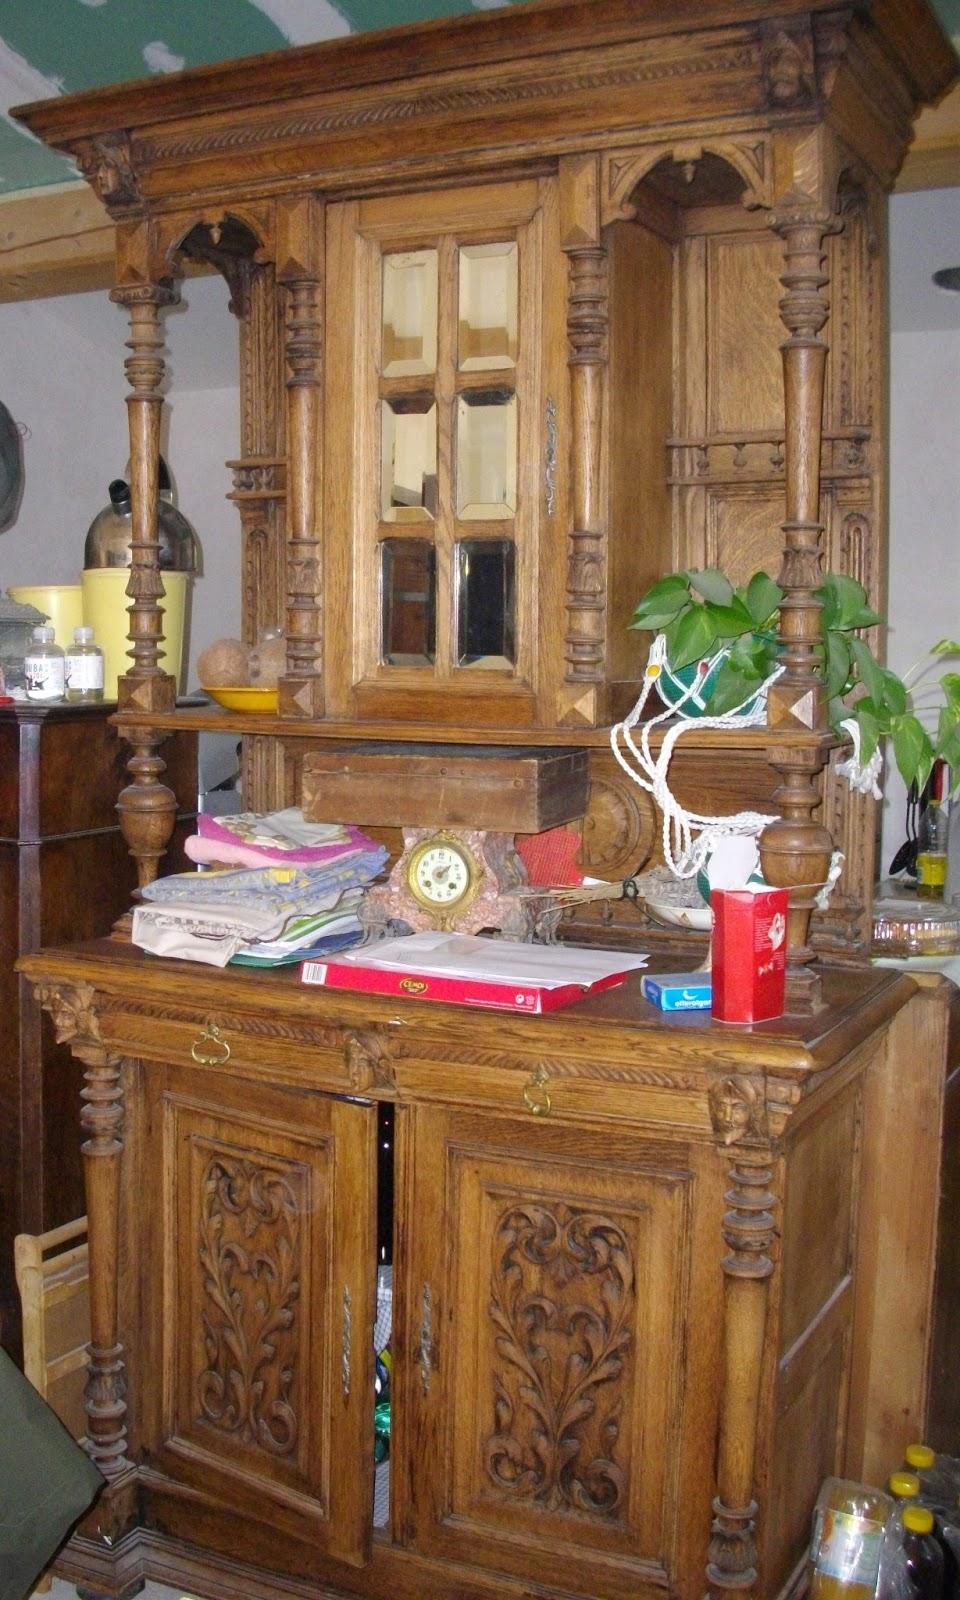 ancien meuble buffet haut deux corps henry ii sculpt b niste xixeme gargouille i brocante. Black Bedroom Furniture Sets. Home Design Ideas